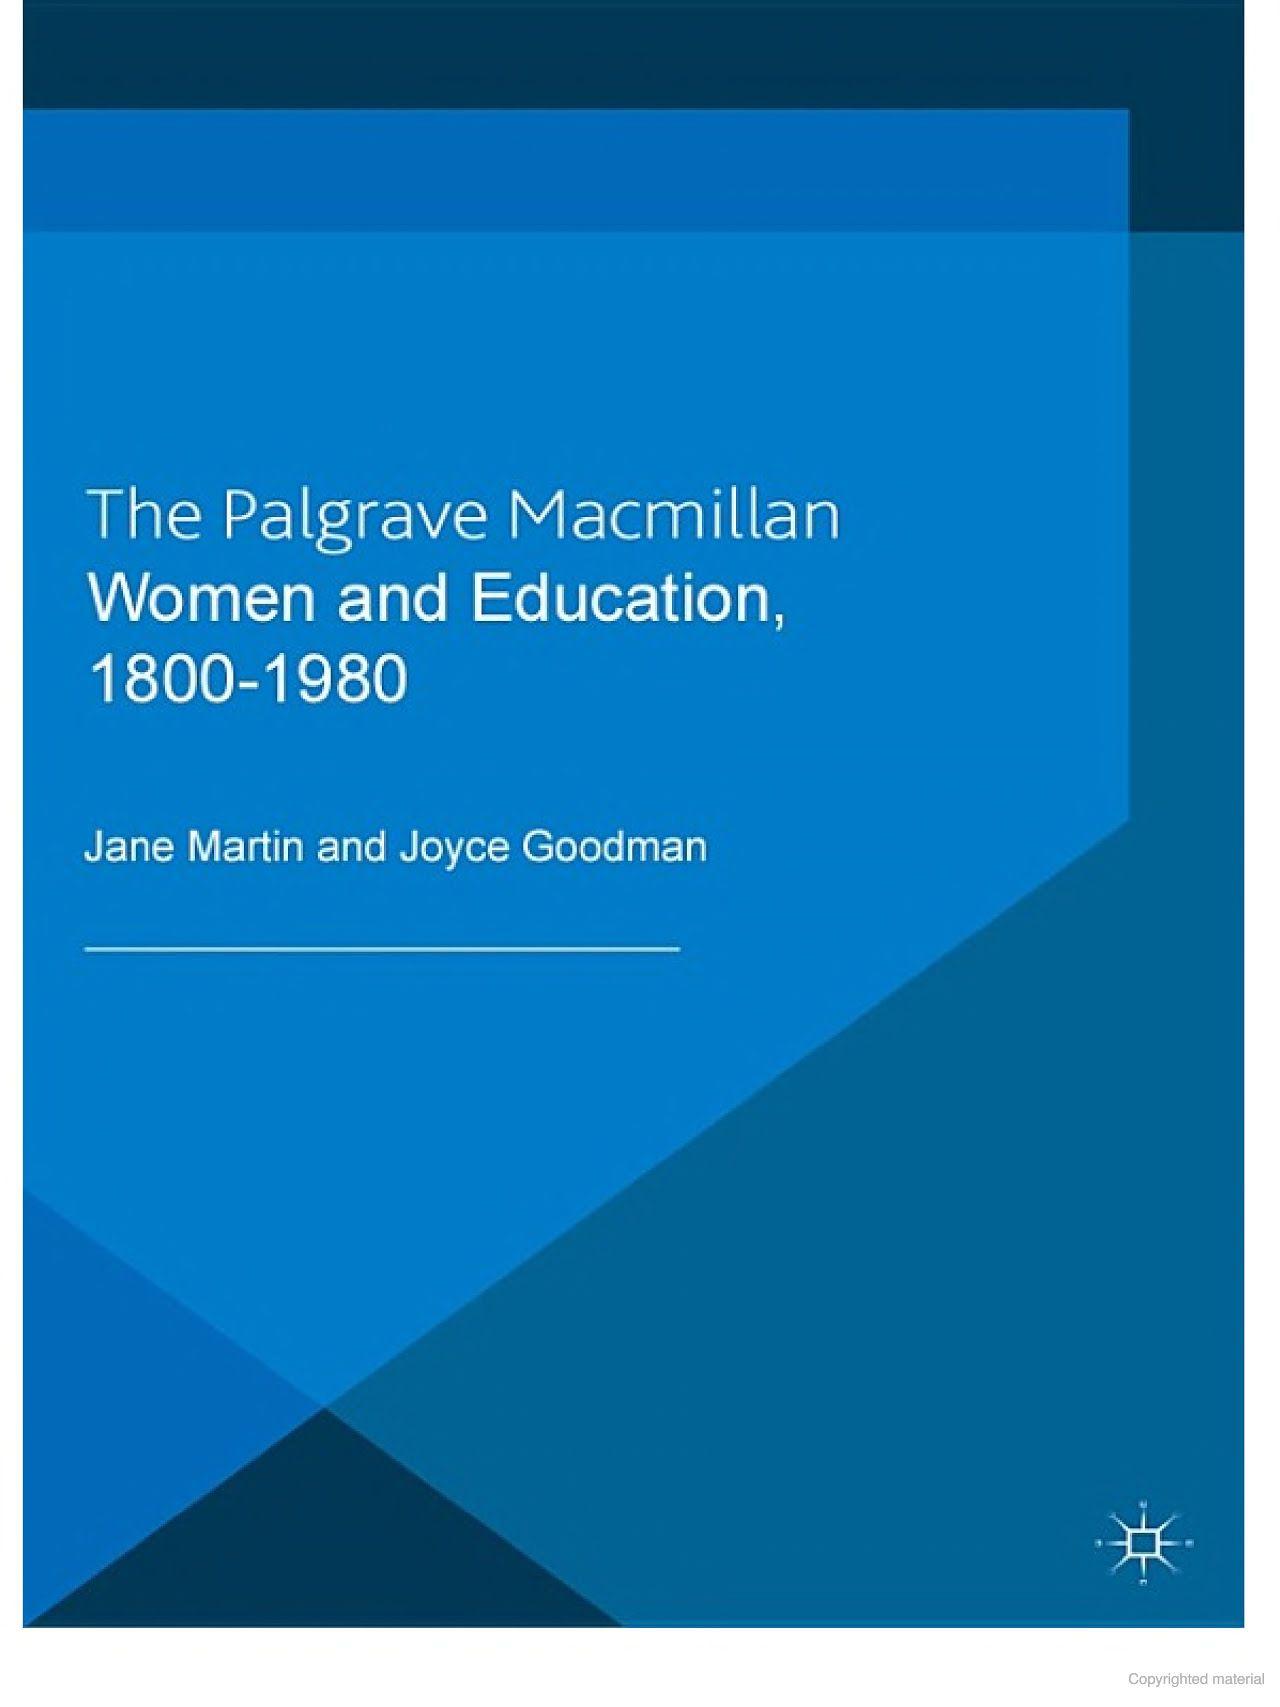 women and education 1800 1980 jane martin joyce goodman google